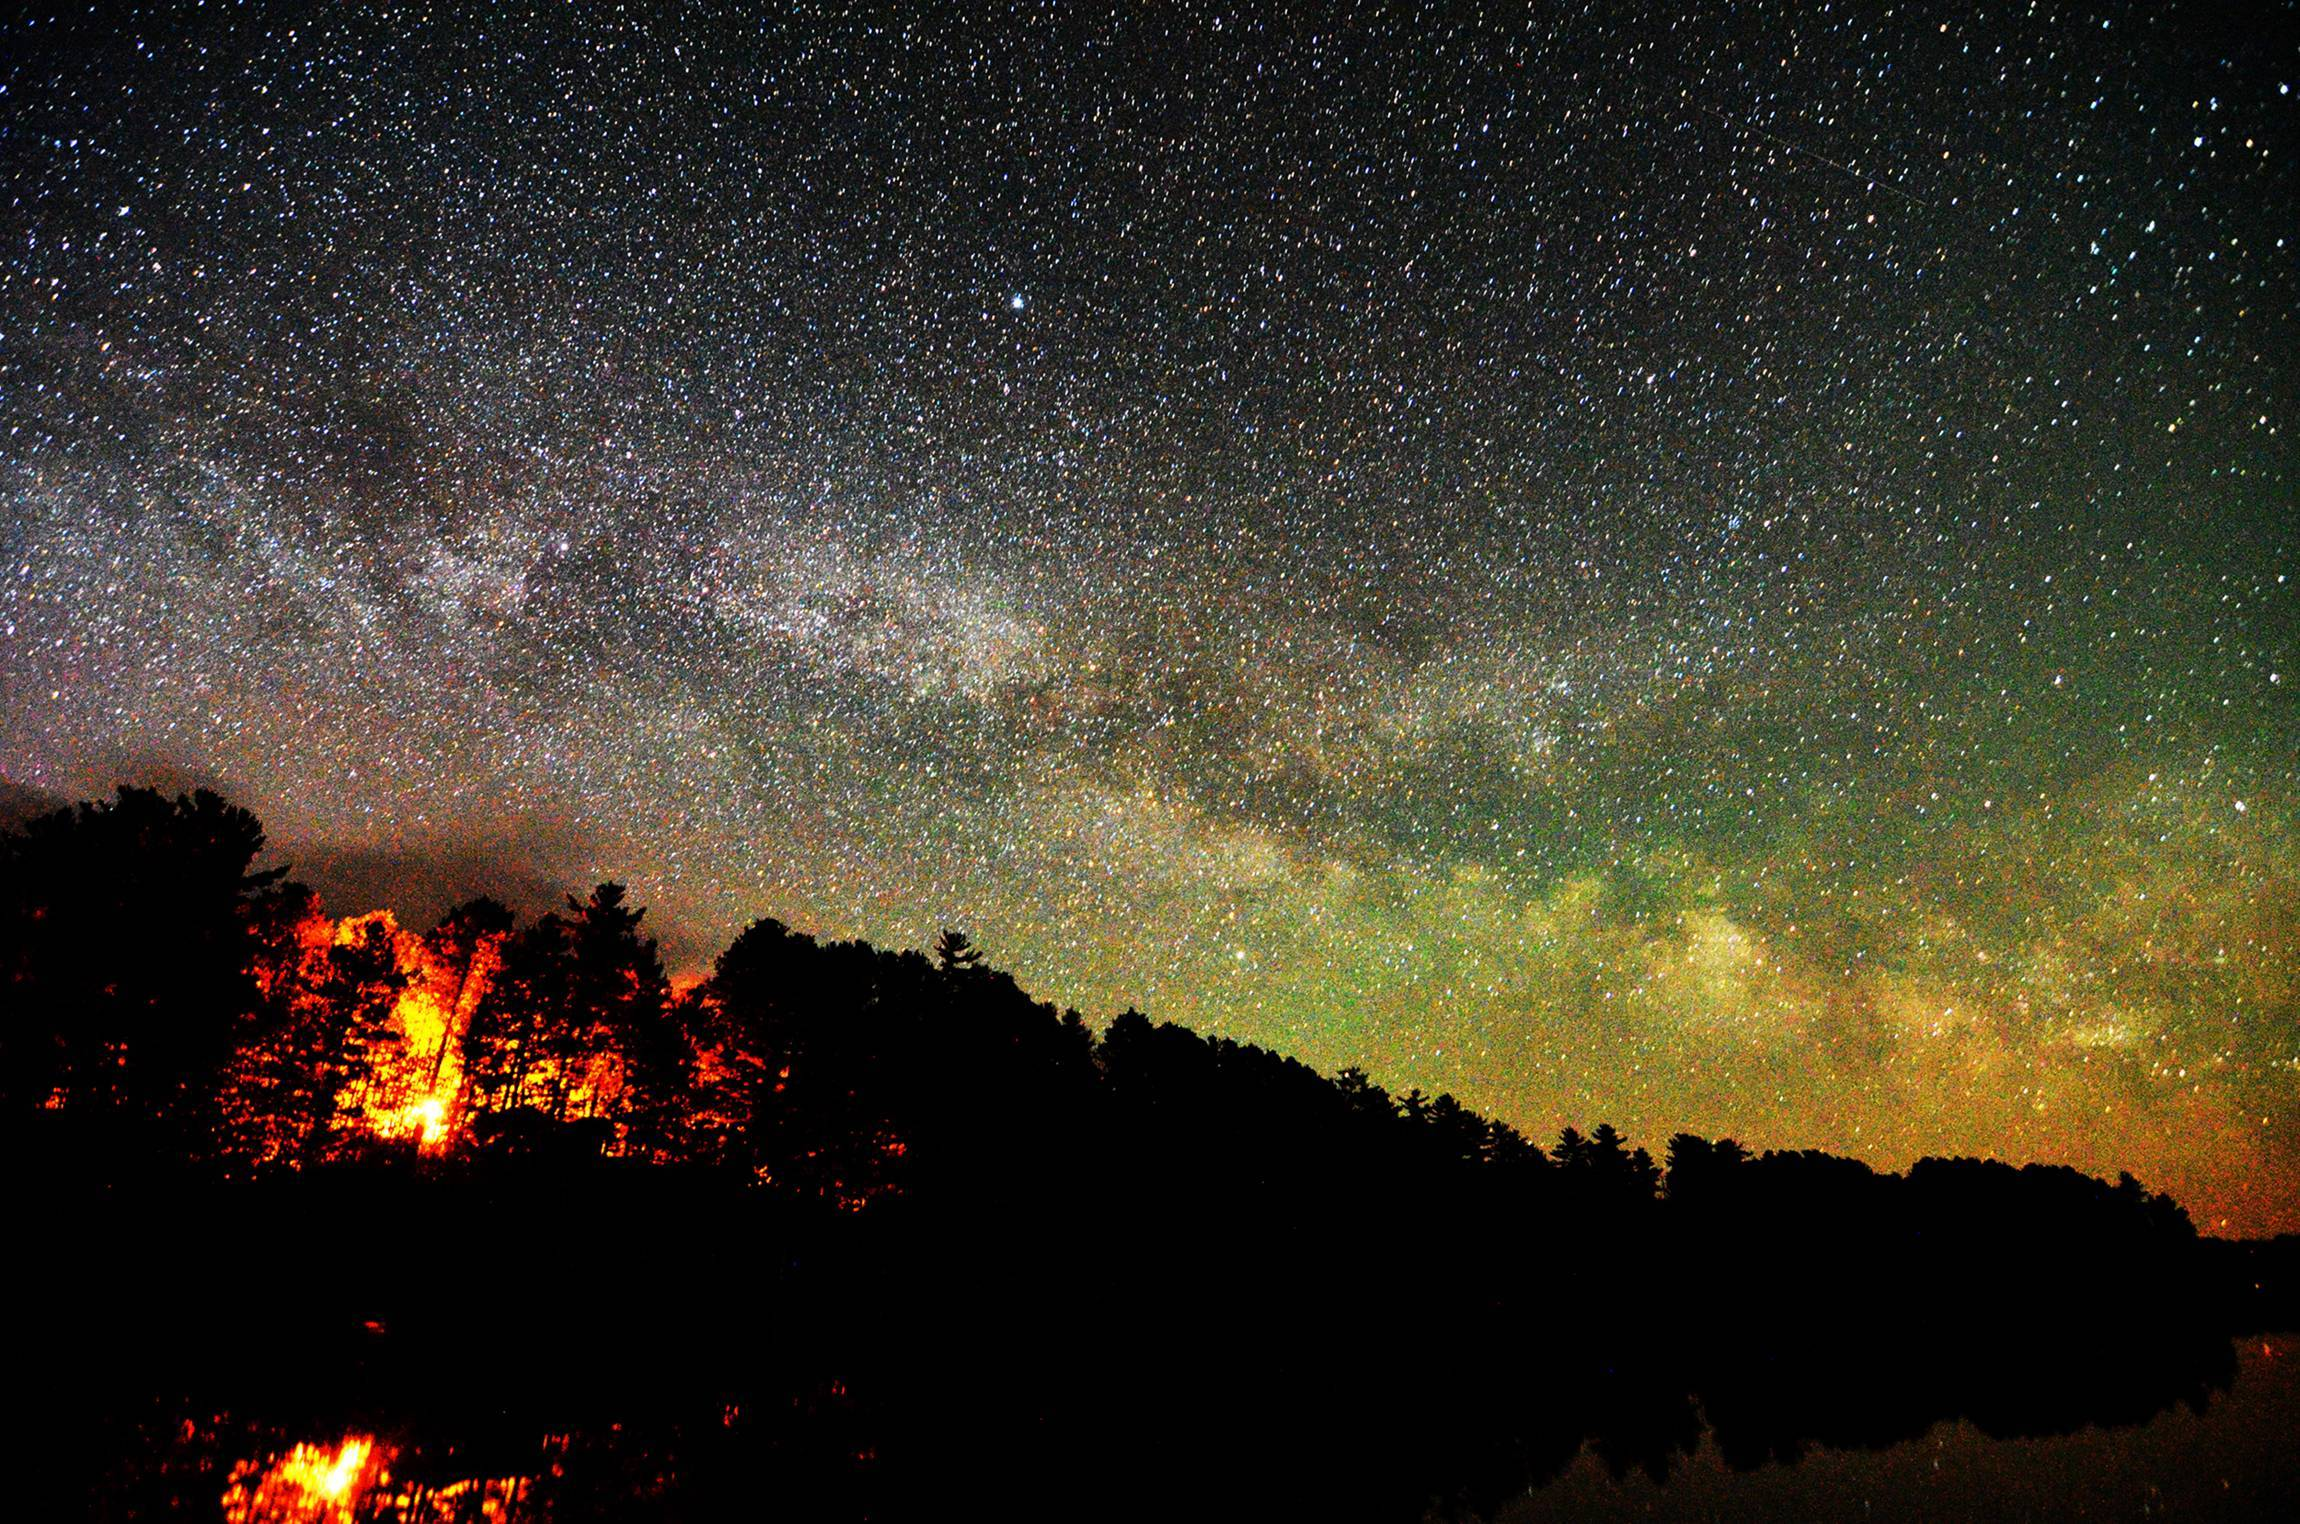 Real Night Sky Wallpaper Hd Night sky 2300x1524